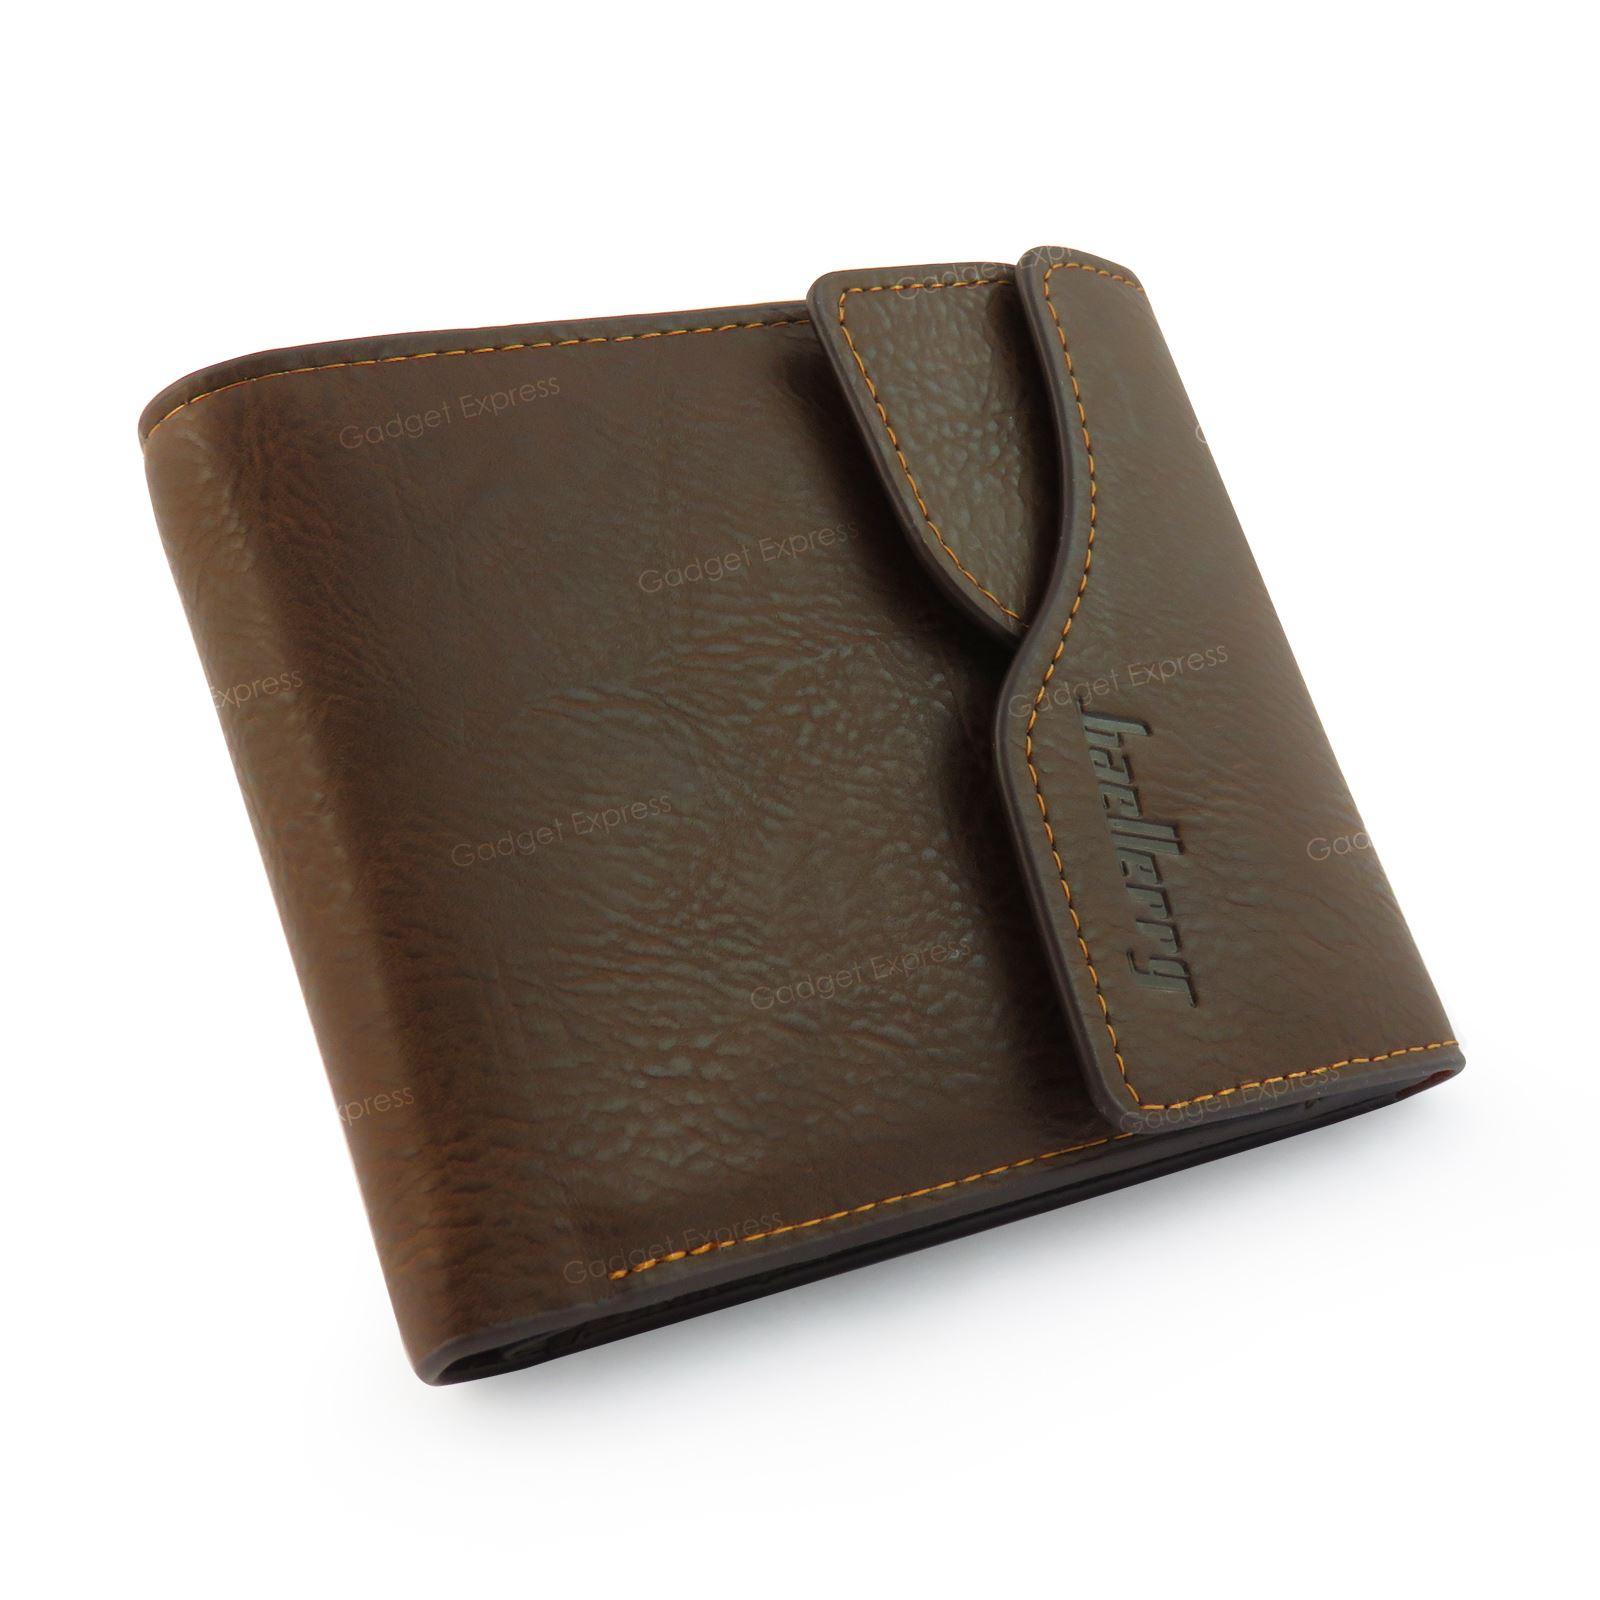 MENS HIGH QUALITY GENUINE SOFT LEATHER BI-FOLD WALLET CREDIT CARD SLOTS 002